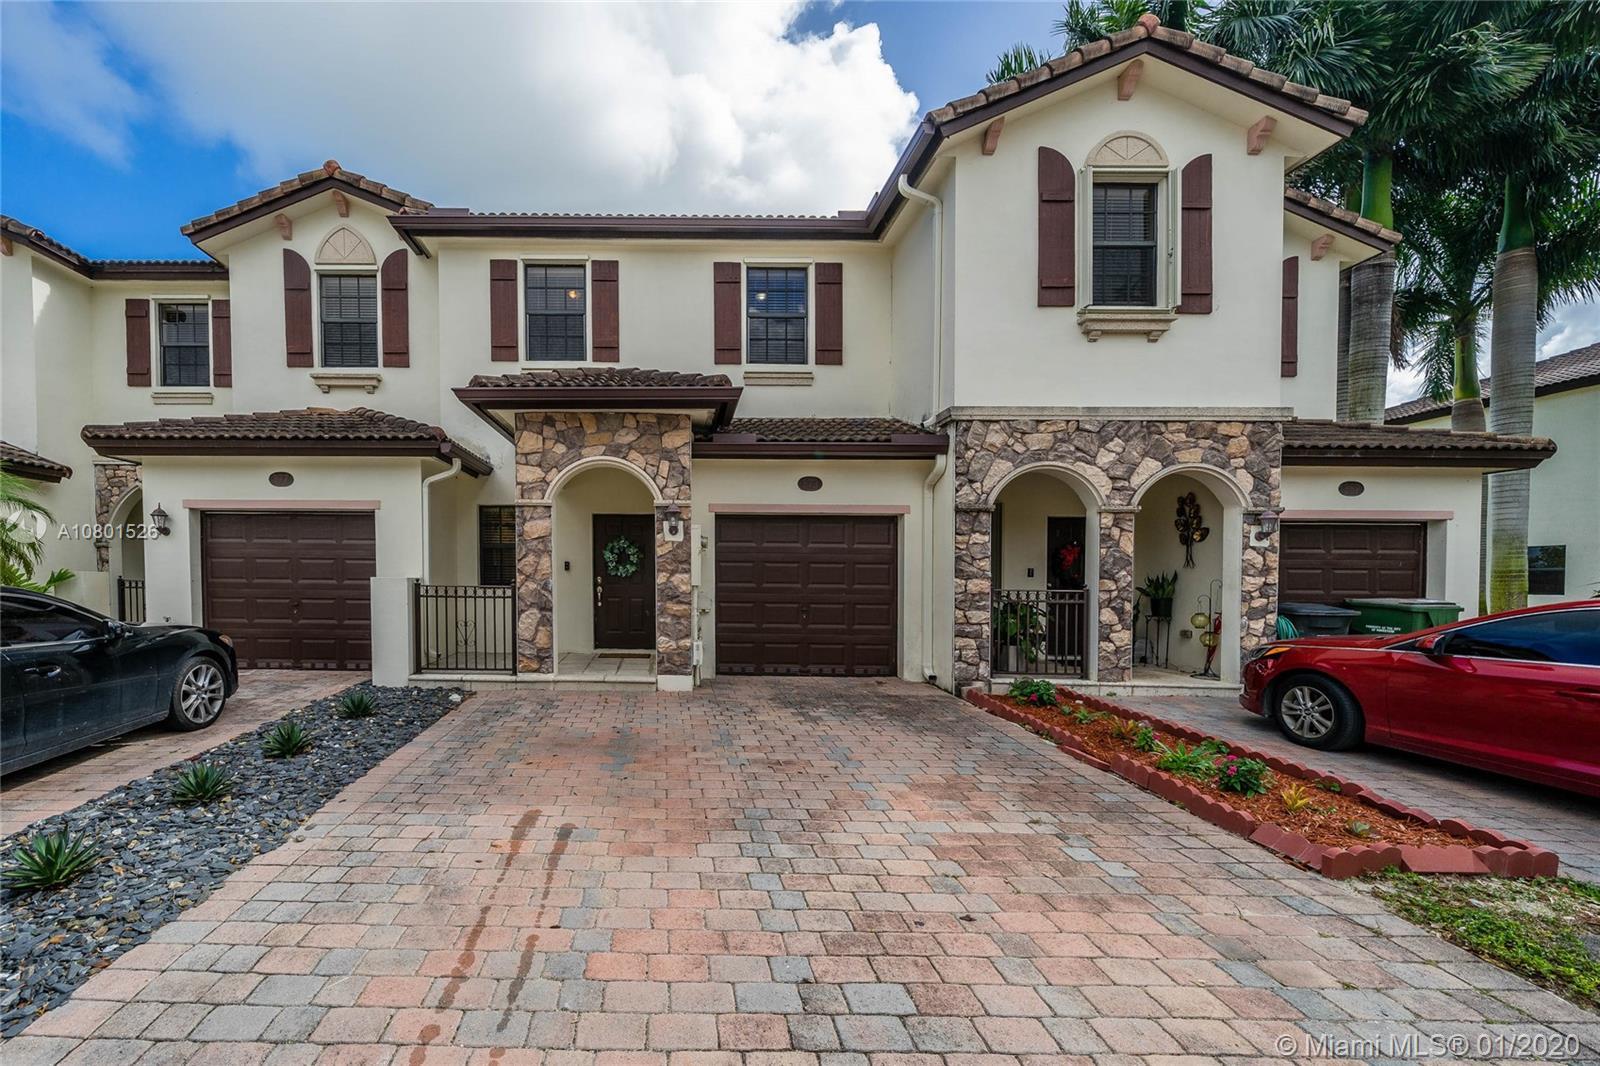 373 NE 37th Pl, Homestead, FL 33033 - Homestead, FL real estate listing